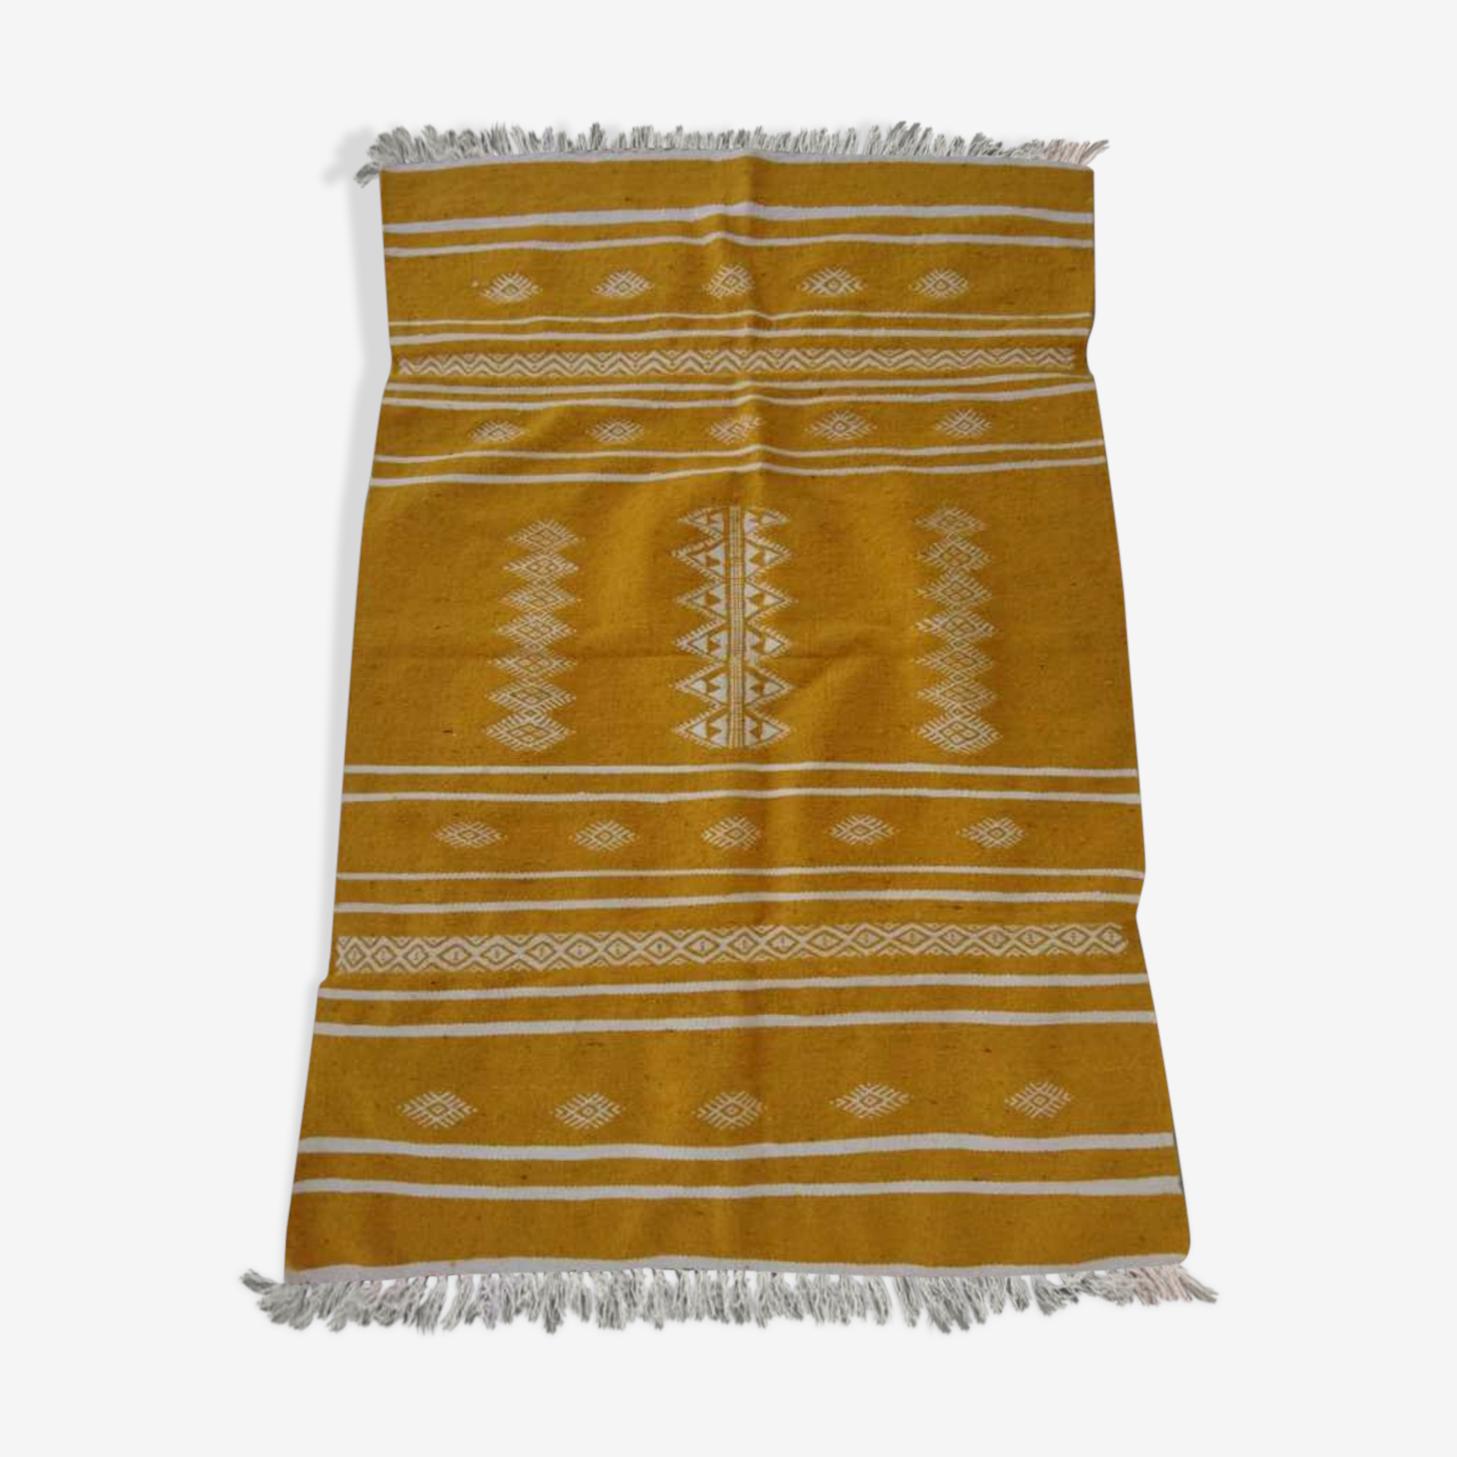 Yellow and white kilim rugs 100x140cm